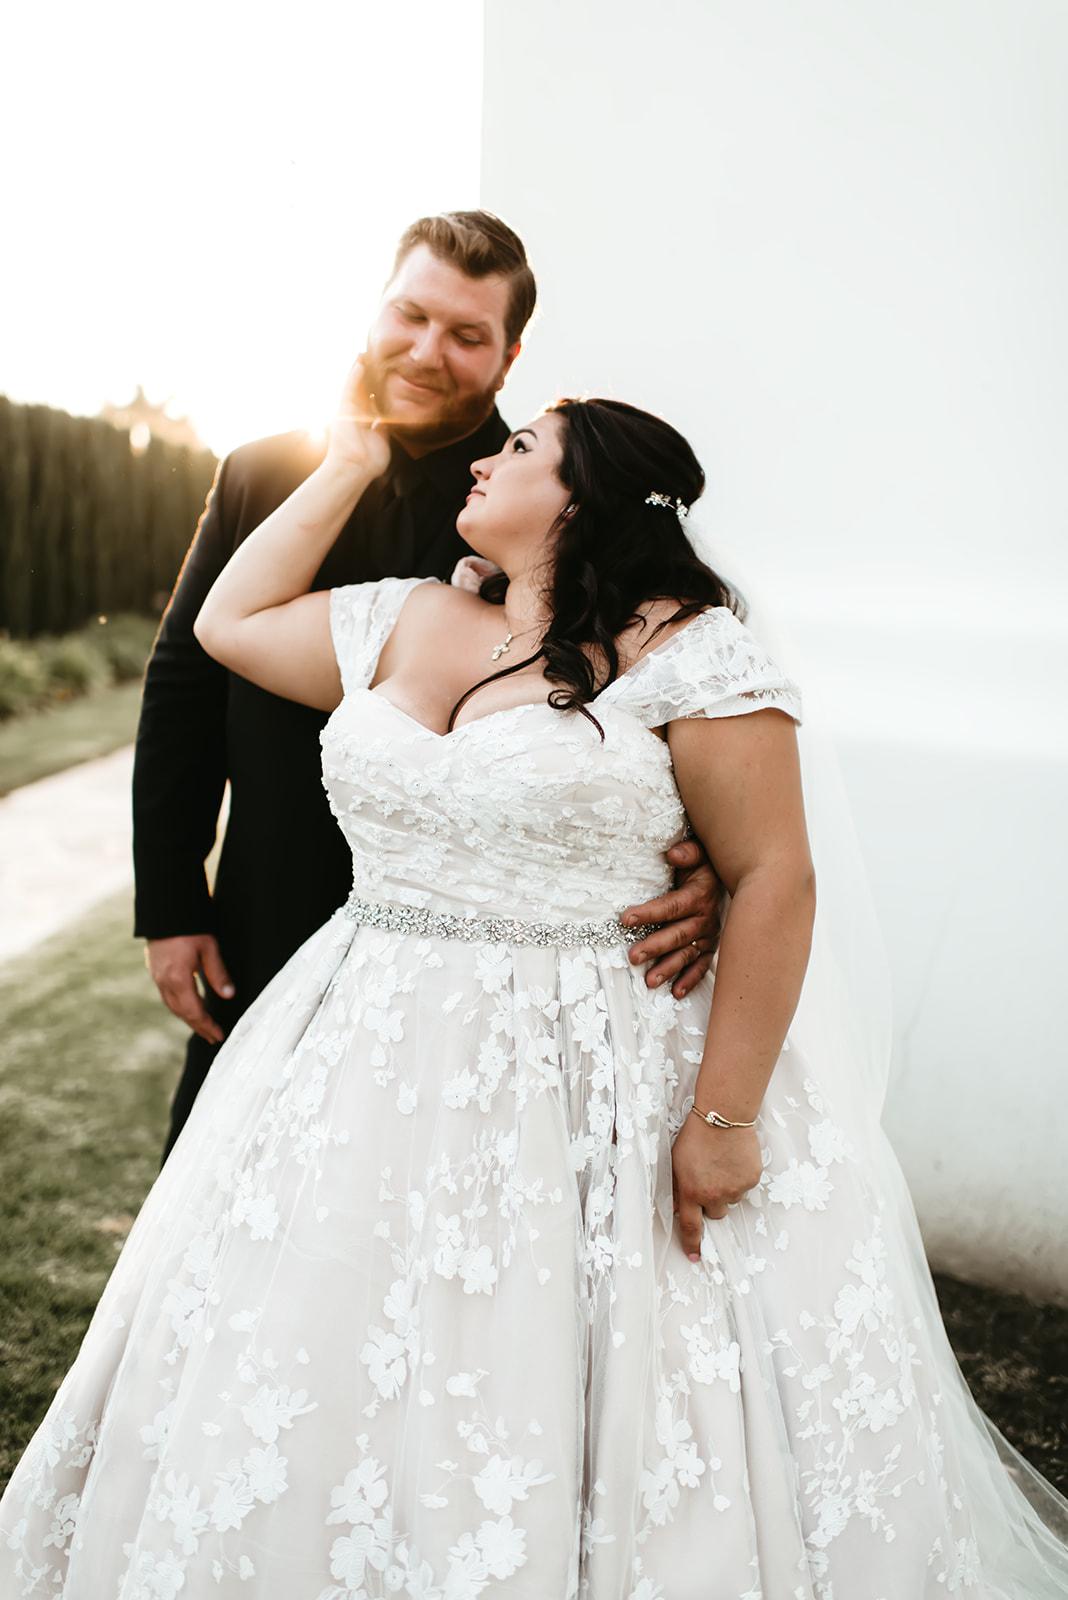 Katrina's Blush Lace Ballgown Wedding Dress